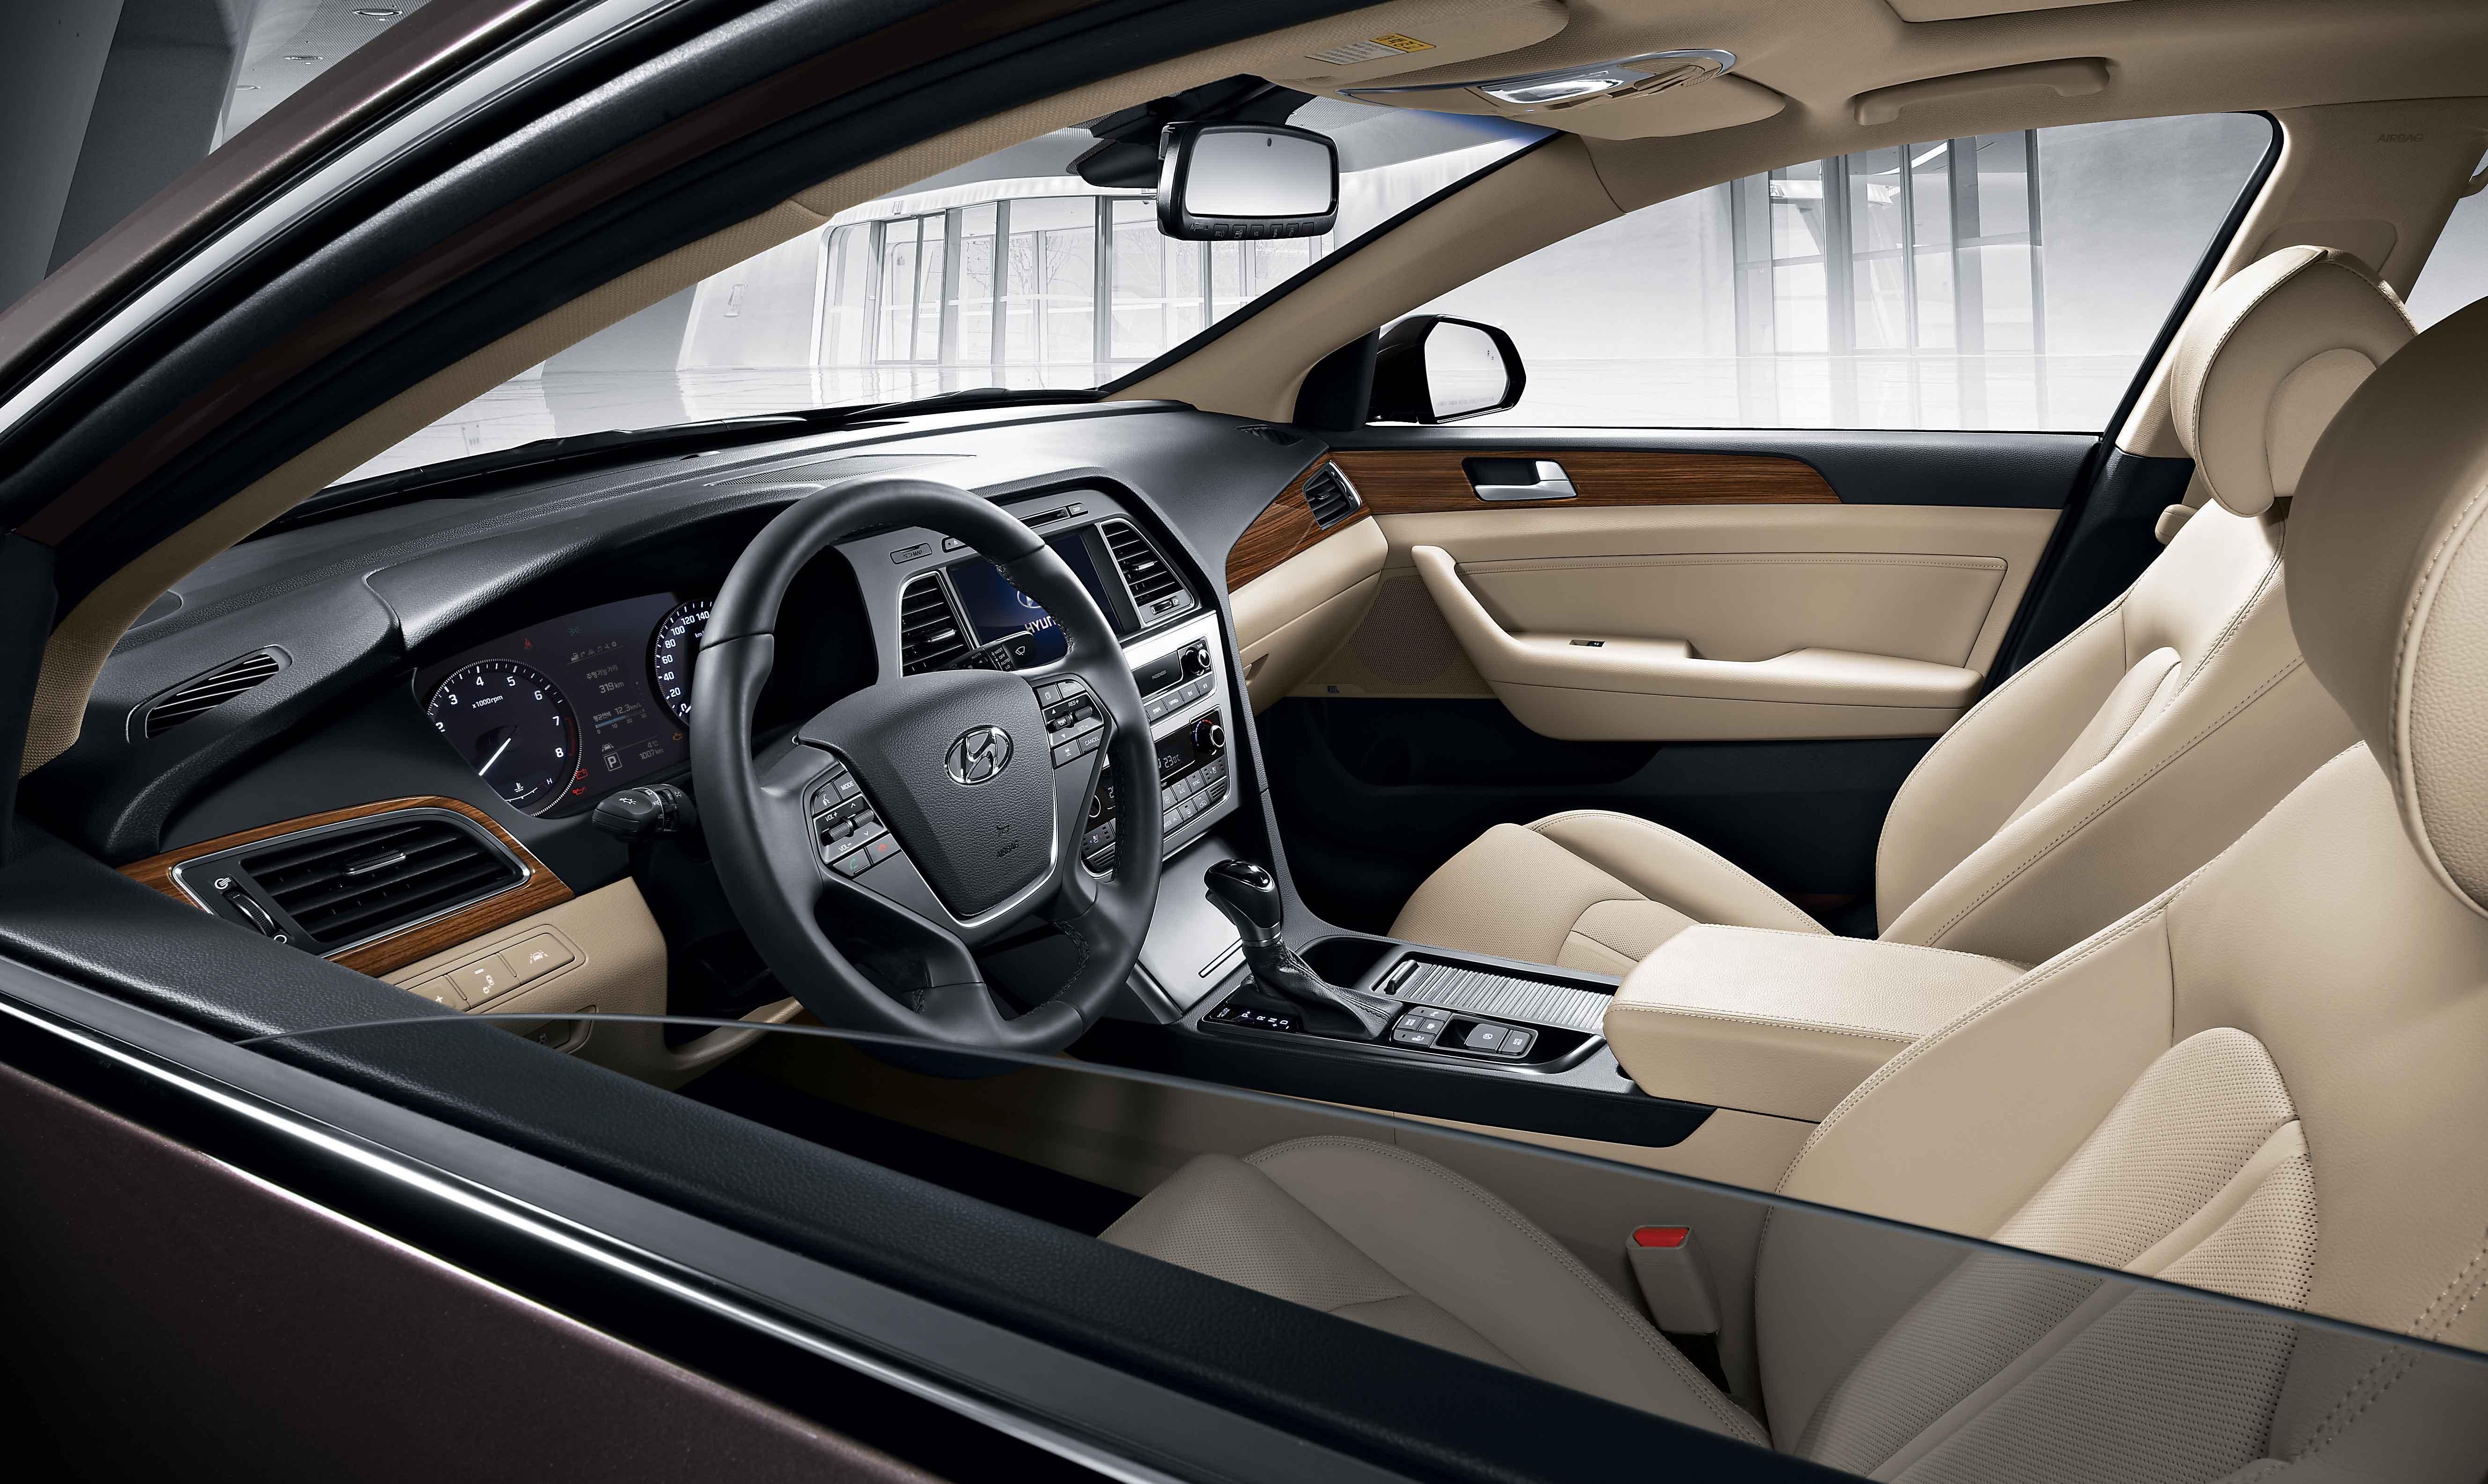 dash front sonata auto infotainment interior hyundai in android integrate reveal korean carplay hyndai and spec to